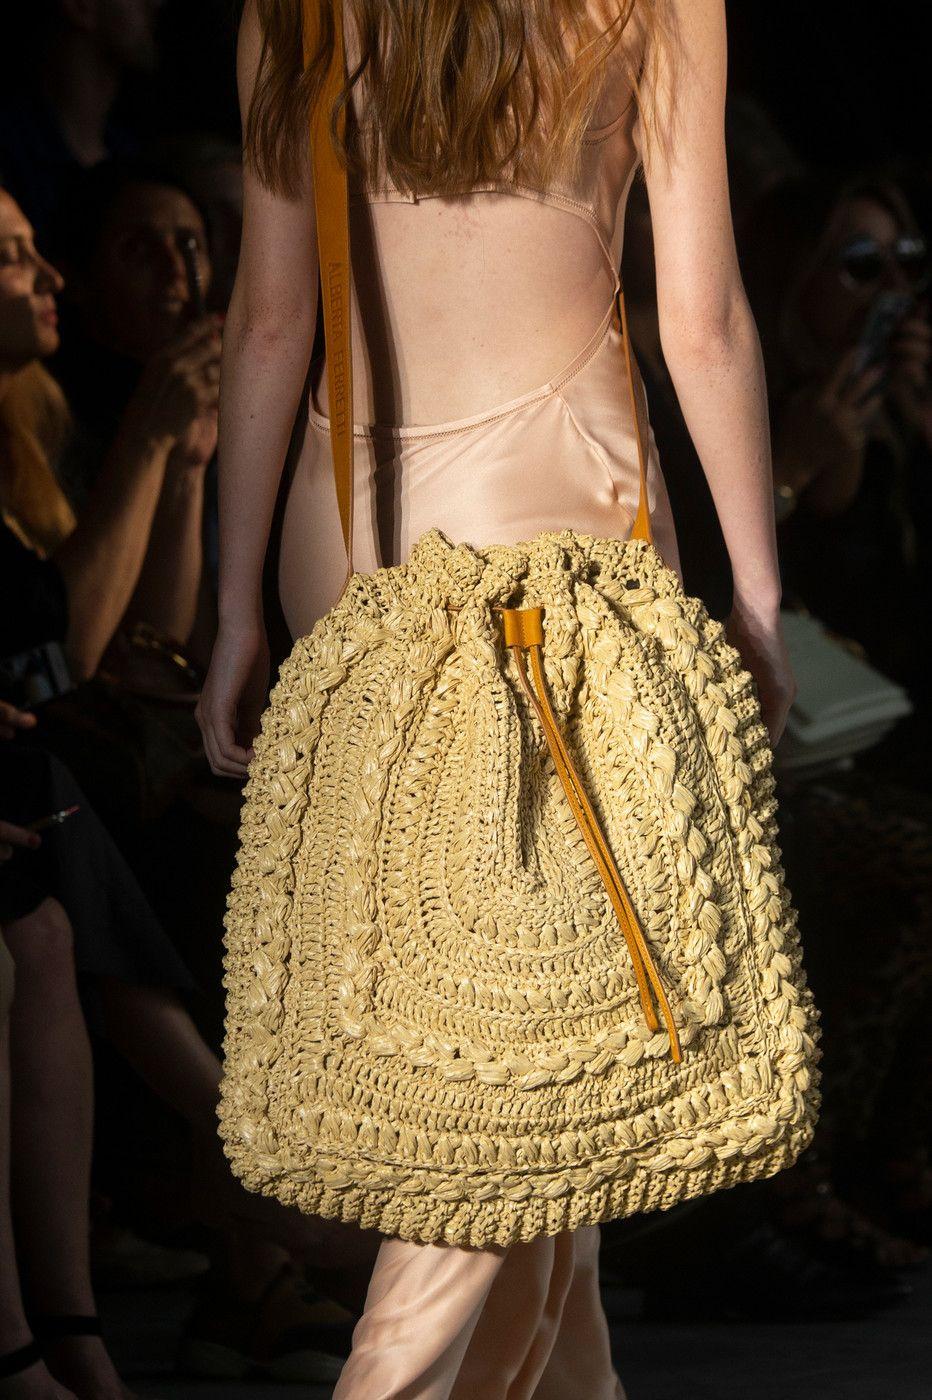 c6eb6169d6d Alberta Ferretti at Milan Fashion Week Spring 2019 - Details Runway Photos  Haute Couture Bags,